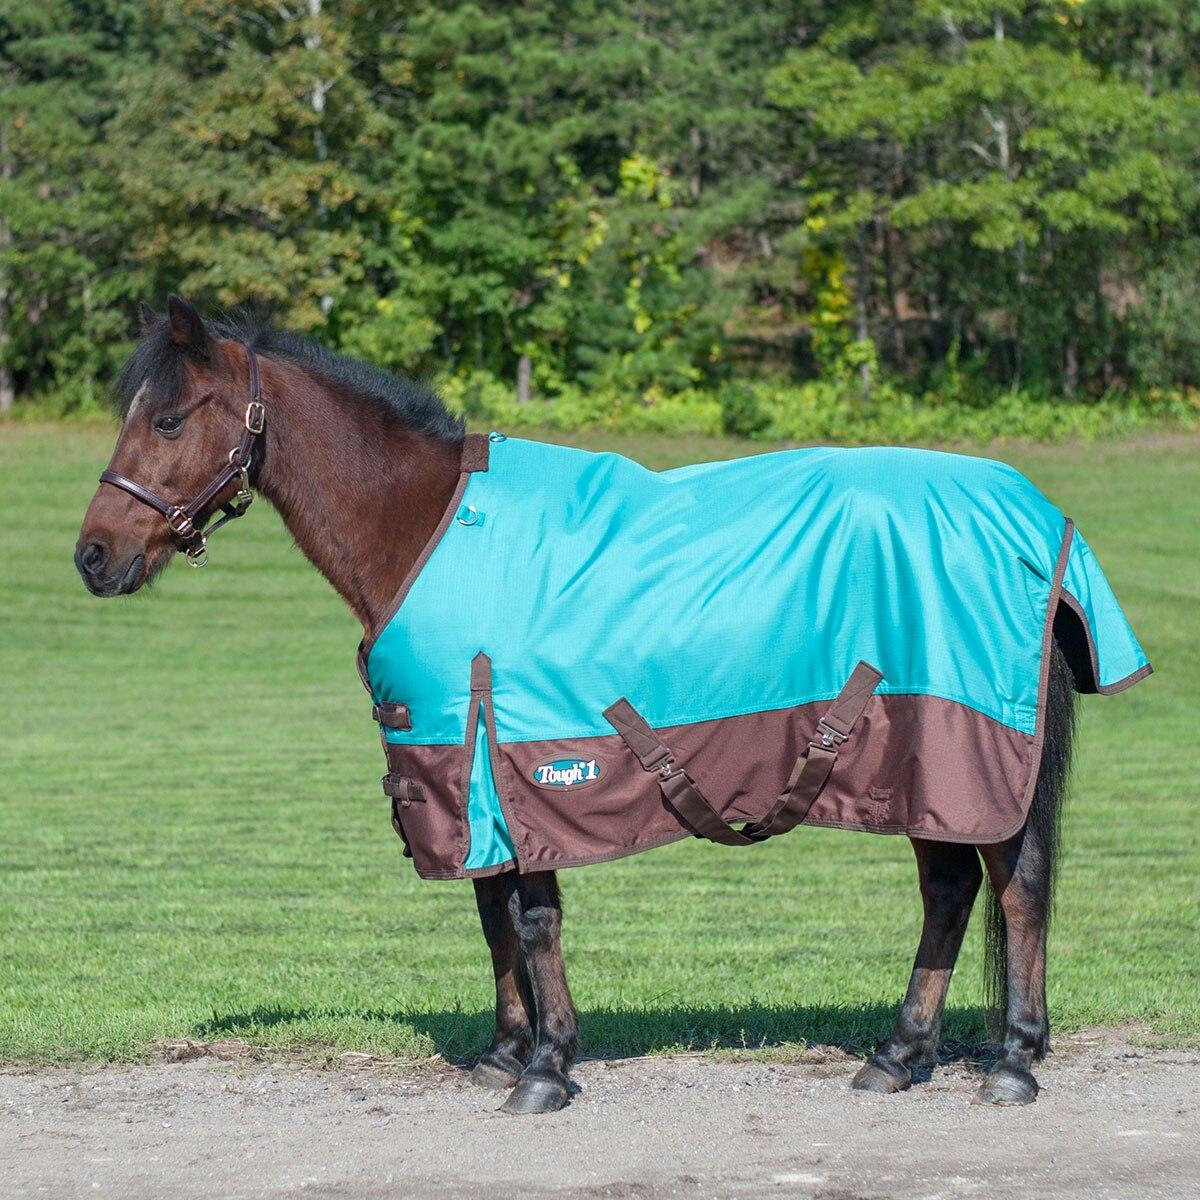 Tough®1 600D Turnout Blanket